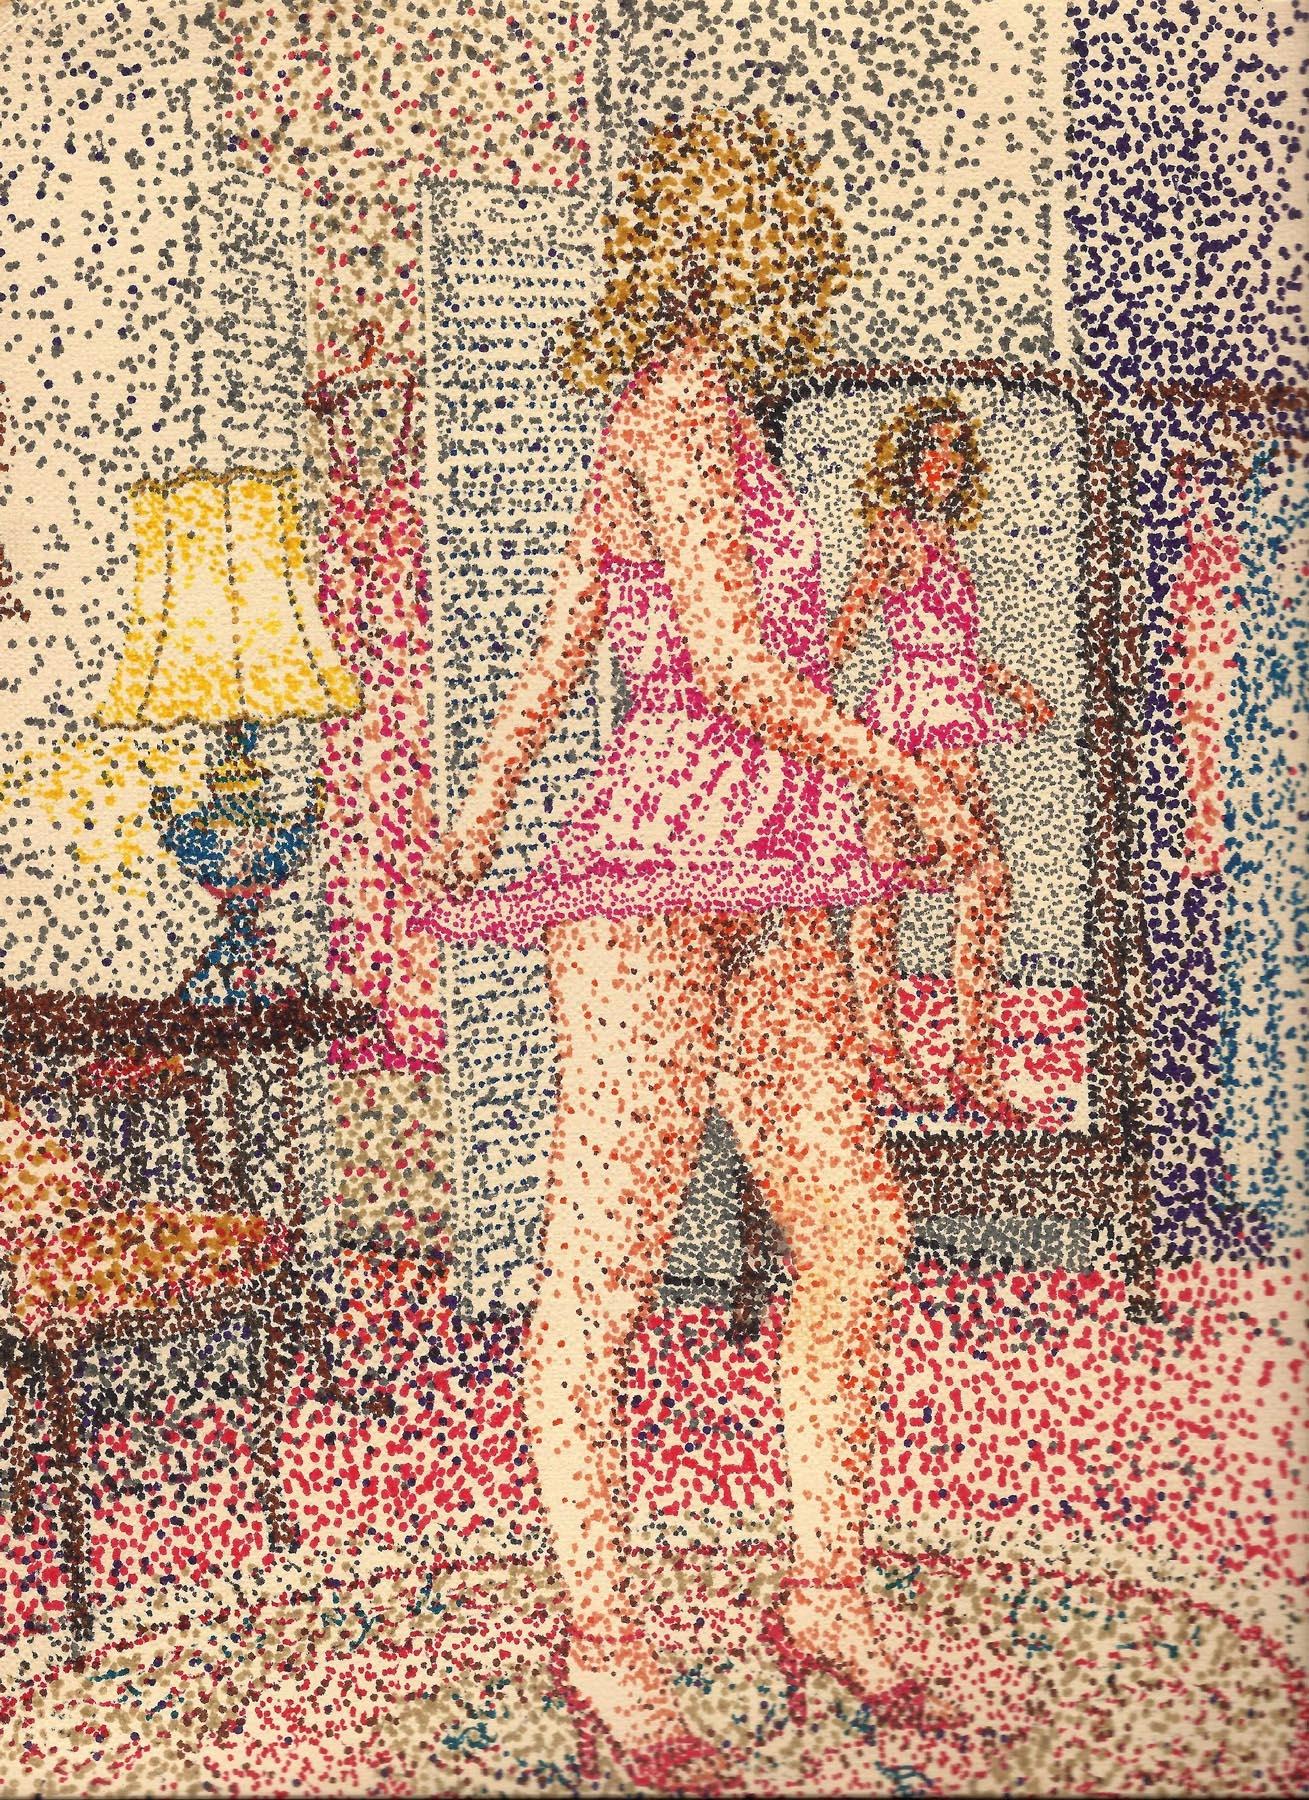 dressing room..pointillism sket - zygzwurx | ello